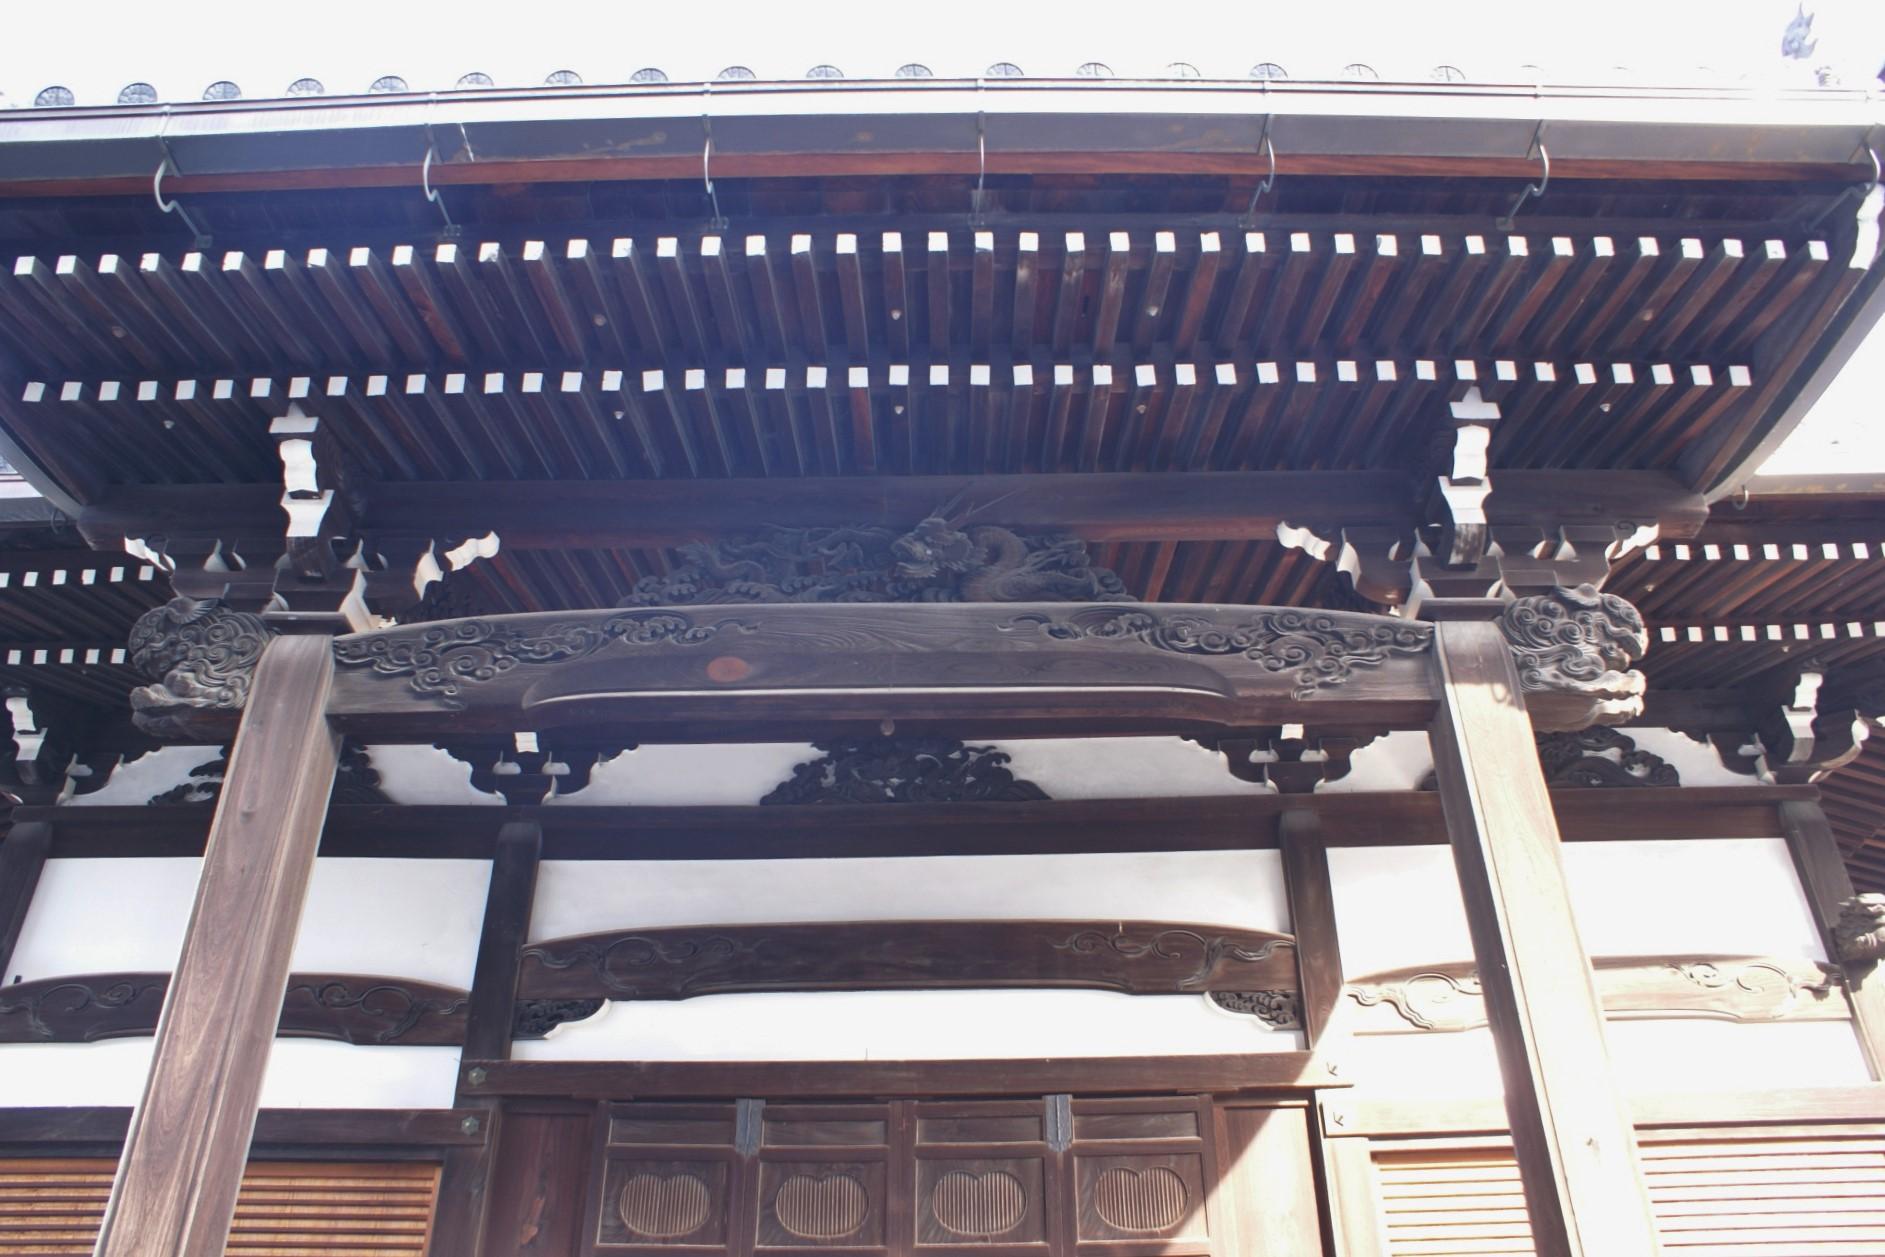 <p>向拝から本殿見上げ</p>頭貫とその上の中備の龍の彫刻、木鼻の獅子頭や建具など細部に丁寧な細工が施されている。また、2軒繁垂木となっている。